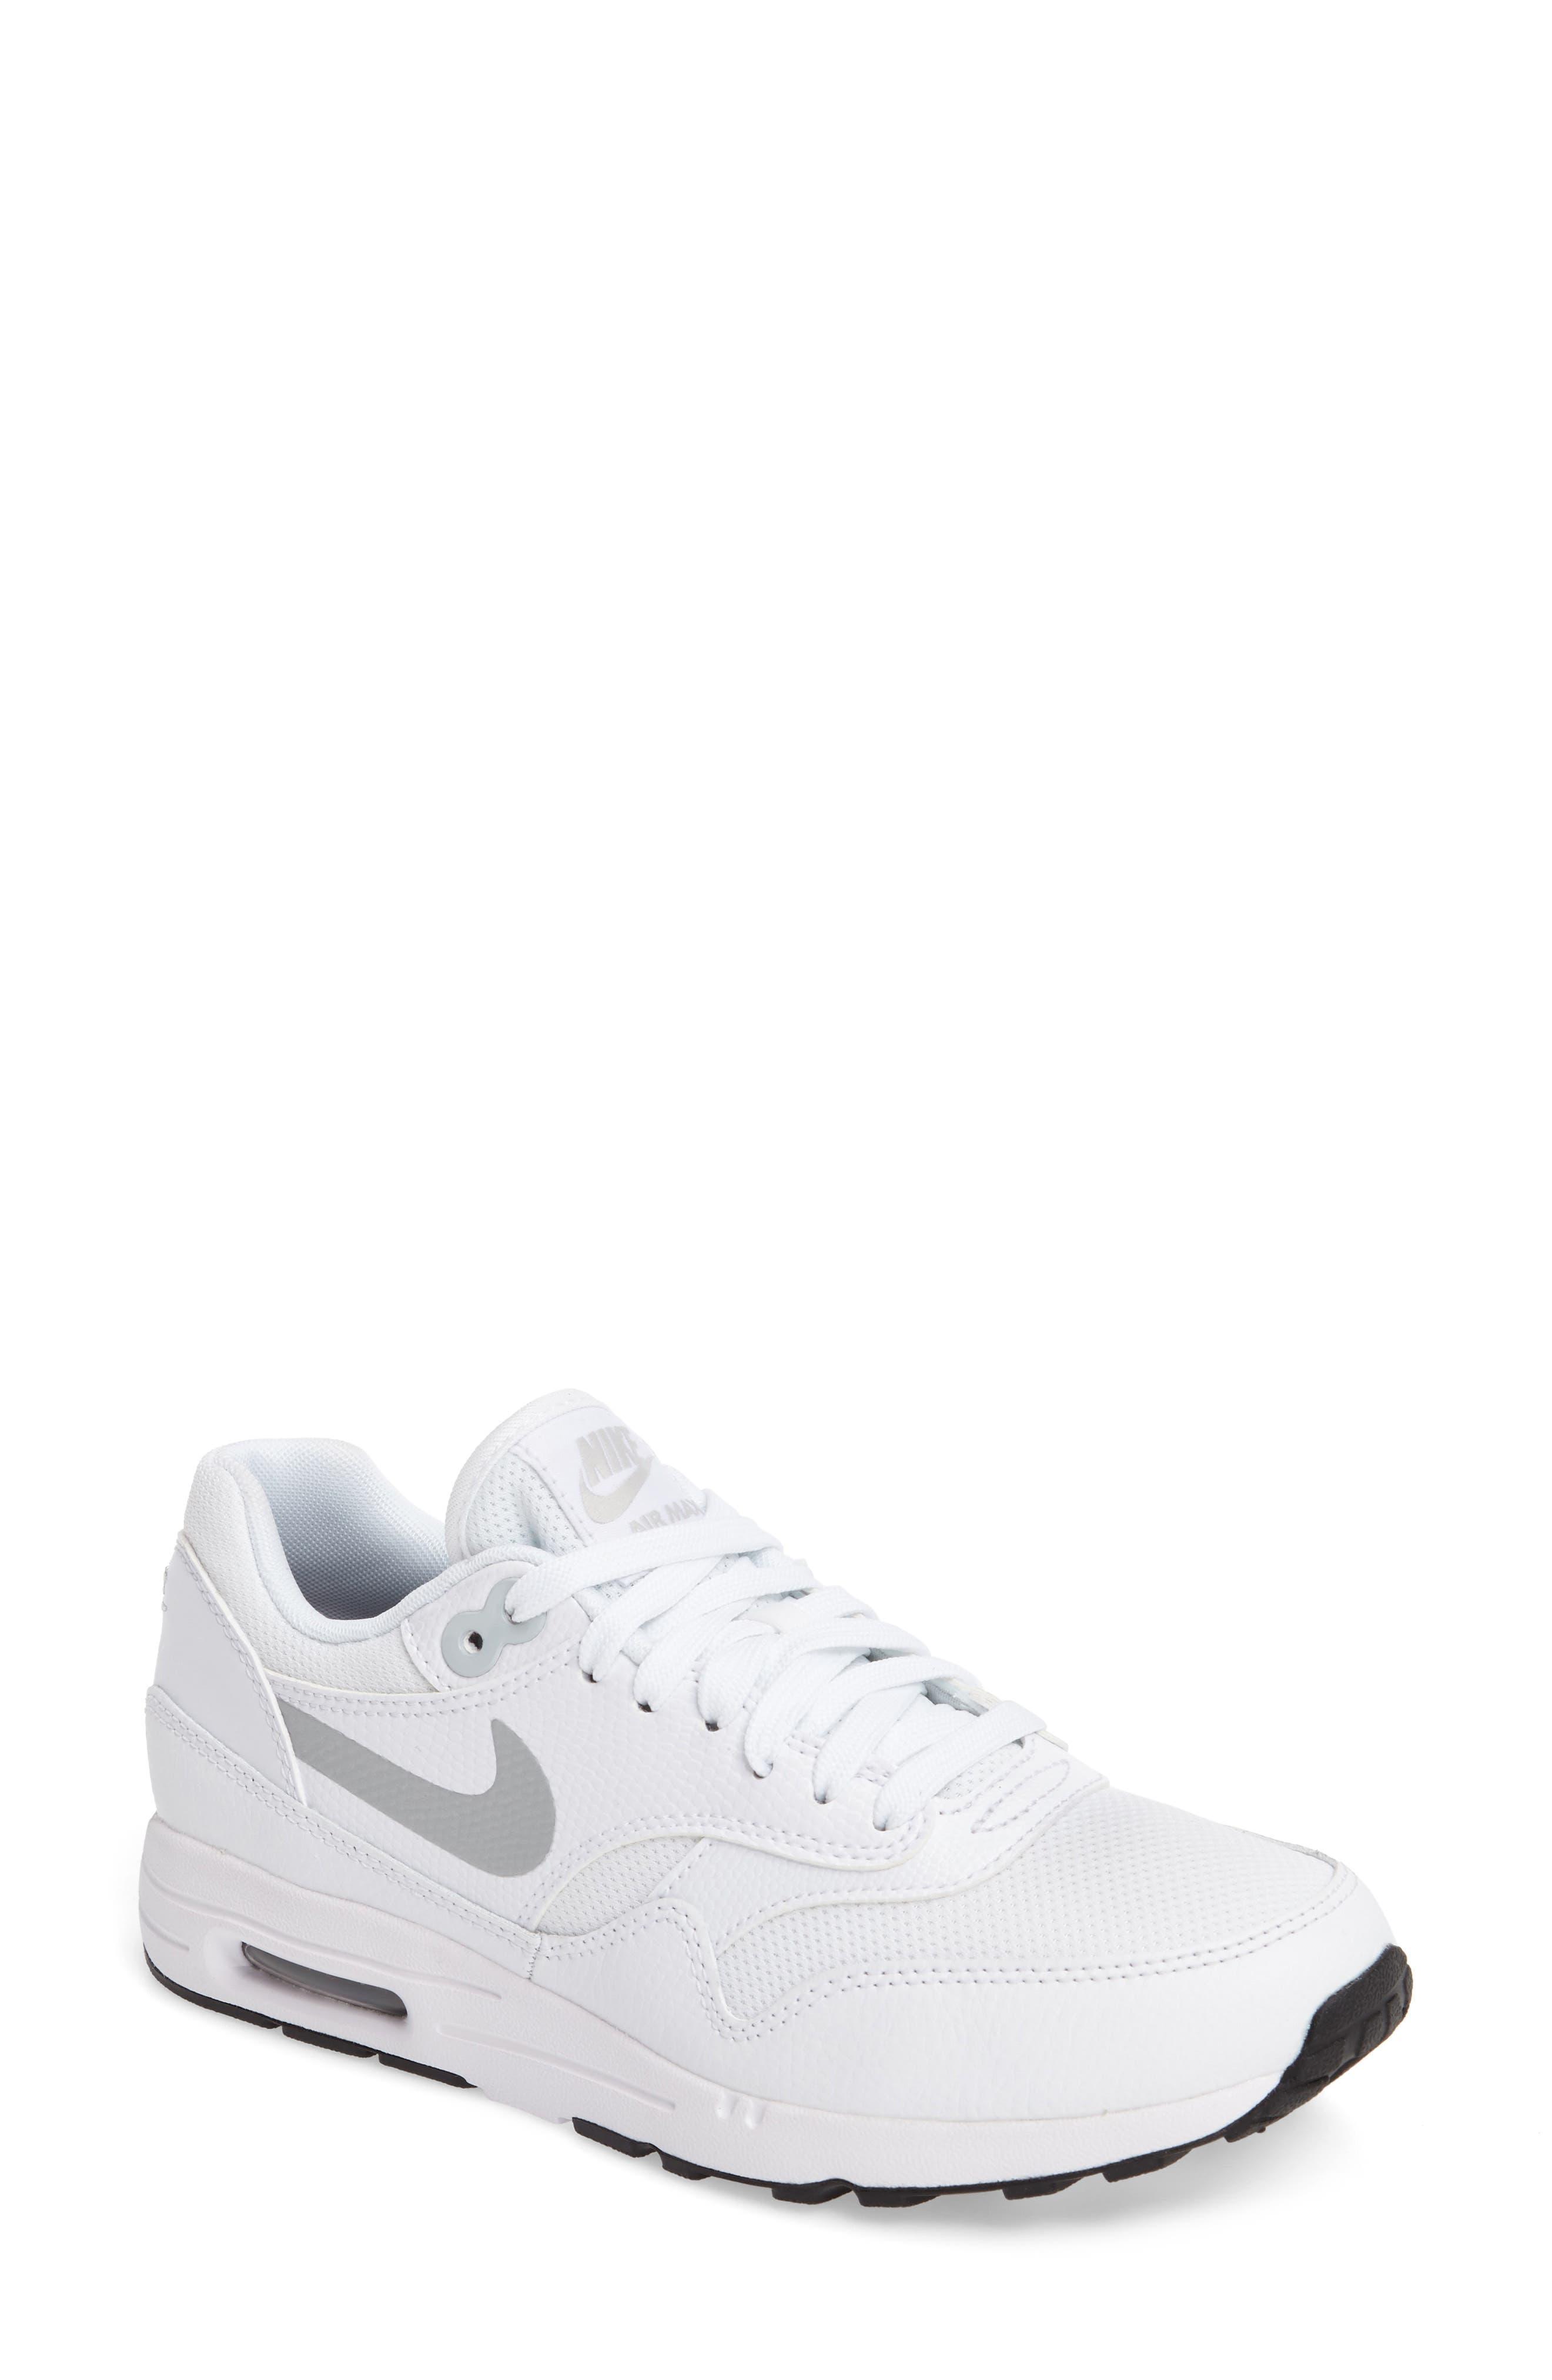 Alternate Image 1 Selected - Nike Air Max 1 Ultra 2.0 Running Shoe (Women)